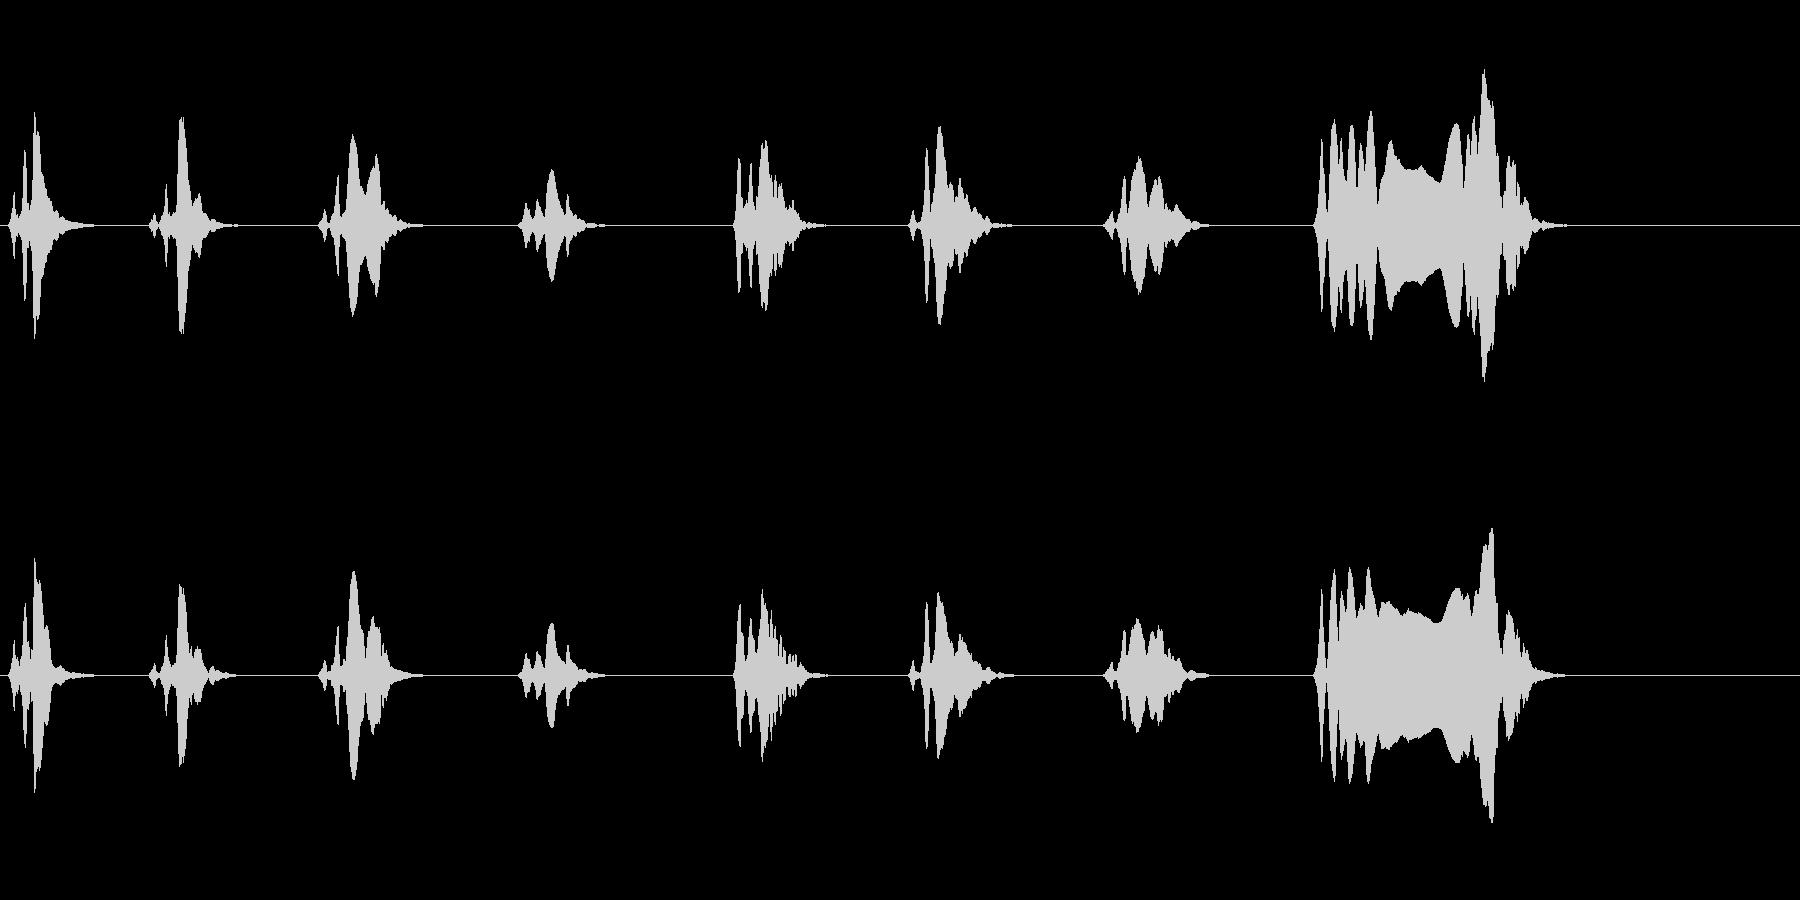 尺八 生演奏 古典風 残響音無 8の未再生の波形